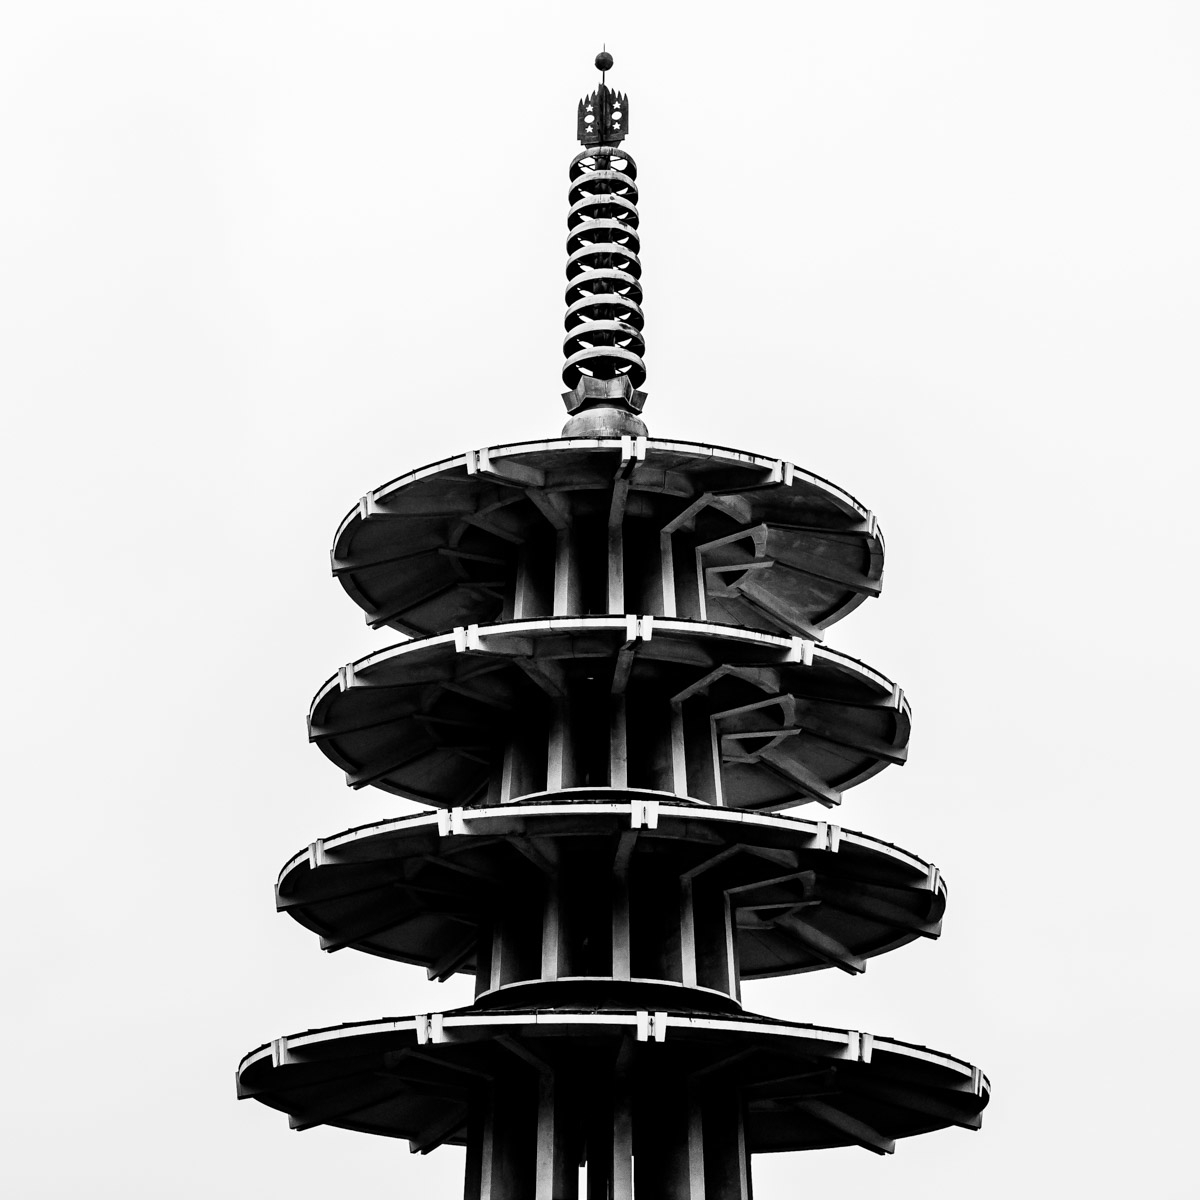 sf japantown pagoda.jpg